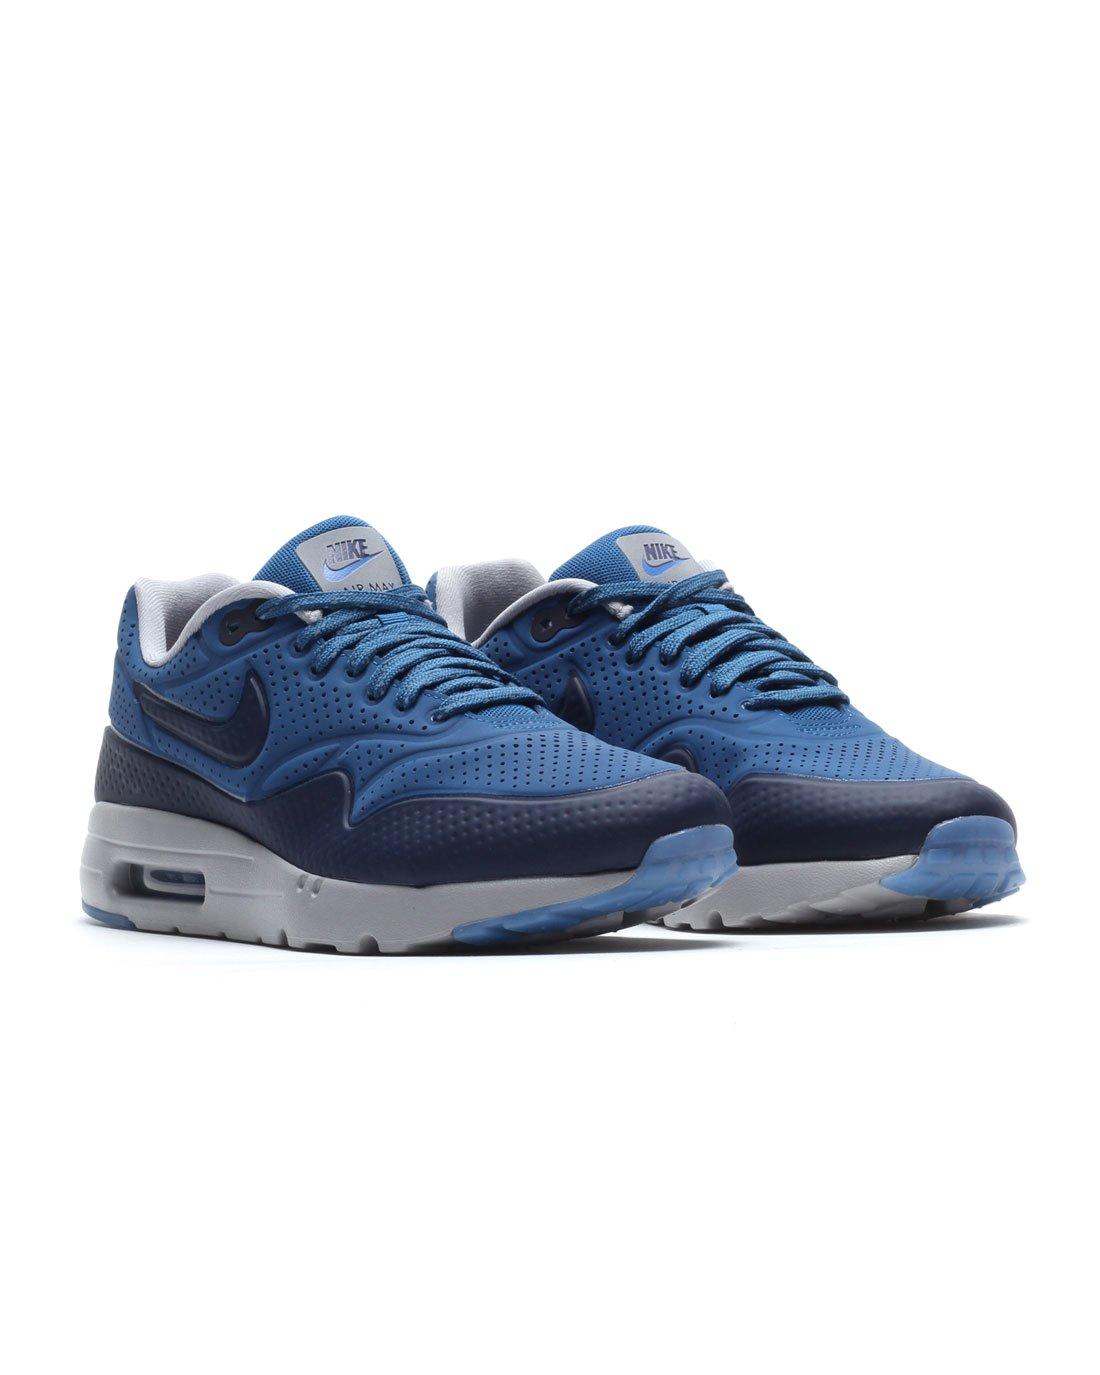 NIKE Herren Schuhe Air Max 1 Ultra Moire 705297402 blau US 7